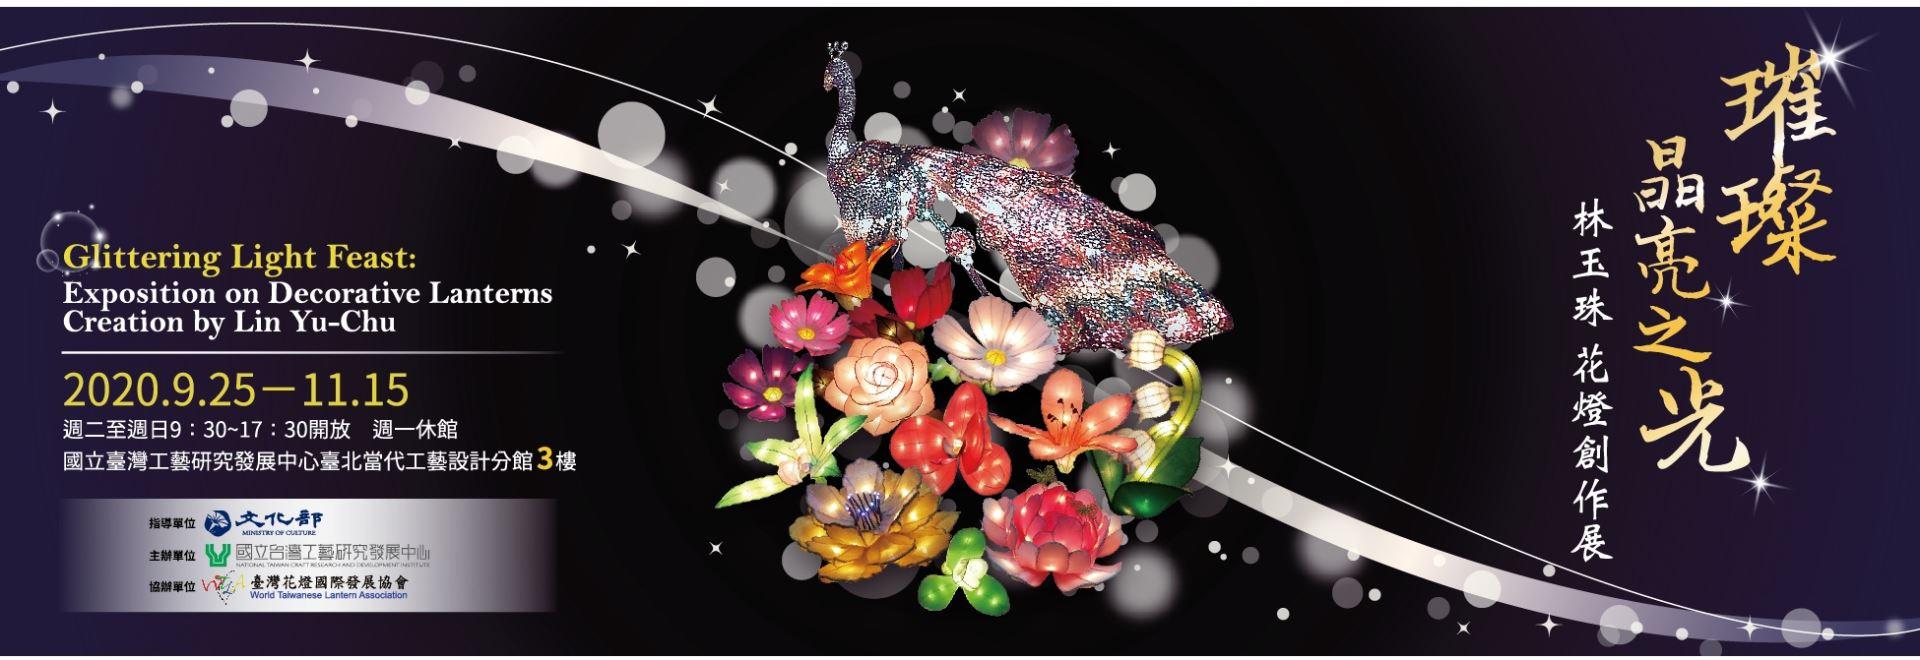 Glittering Light Feast: Exposition on Decorative Lanterns Creation by Lin Yu-Chu「open a new window」